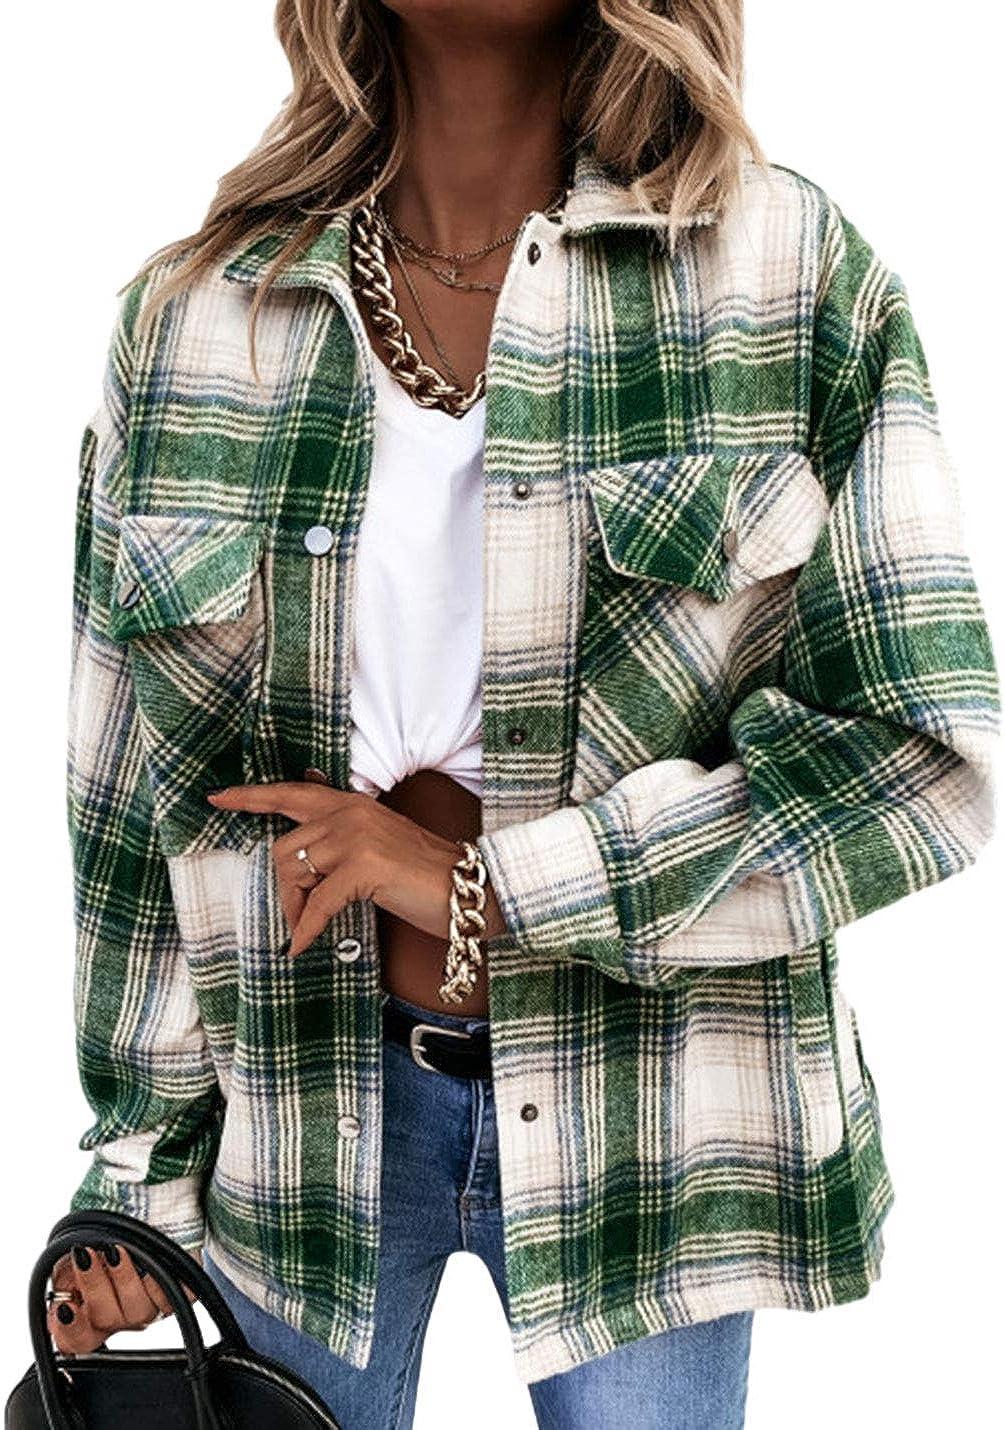 AMEBELLE Women Casual Vintage Plaid Shackets Brushed Long Sleeve Cotton Shirt Jacket